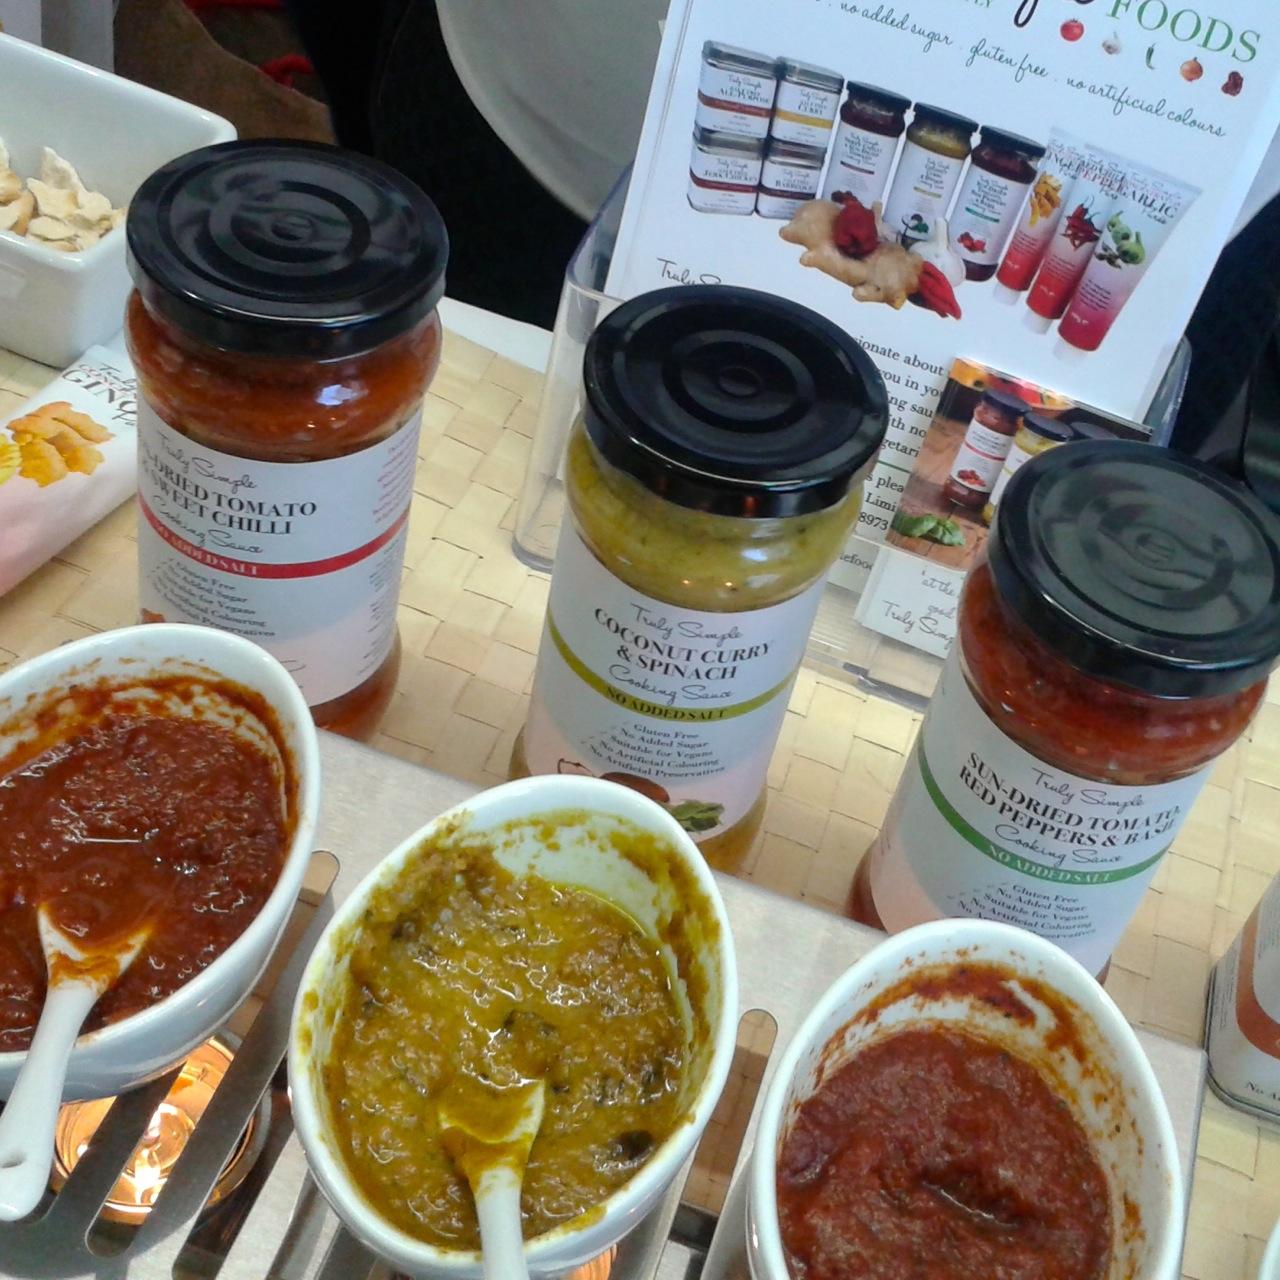 http://fatgayvegan.com/wp-content/uploads/2014/09/truly-simple-sauces.jpg